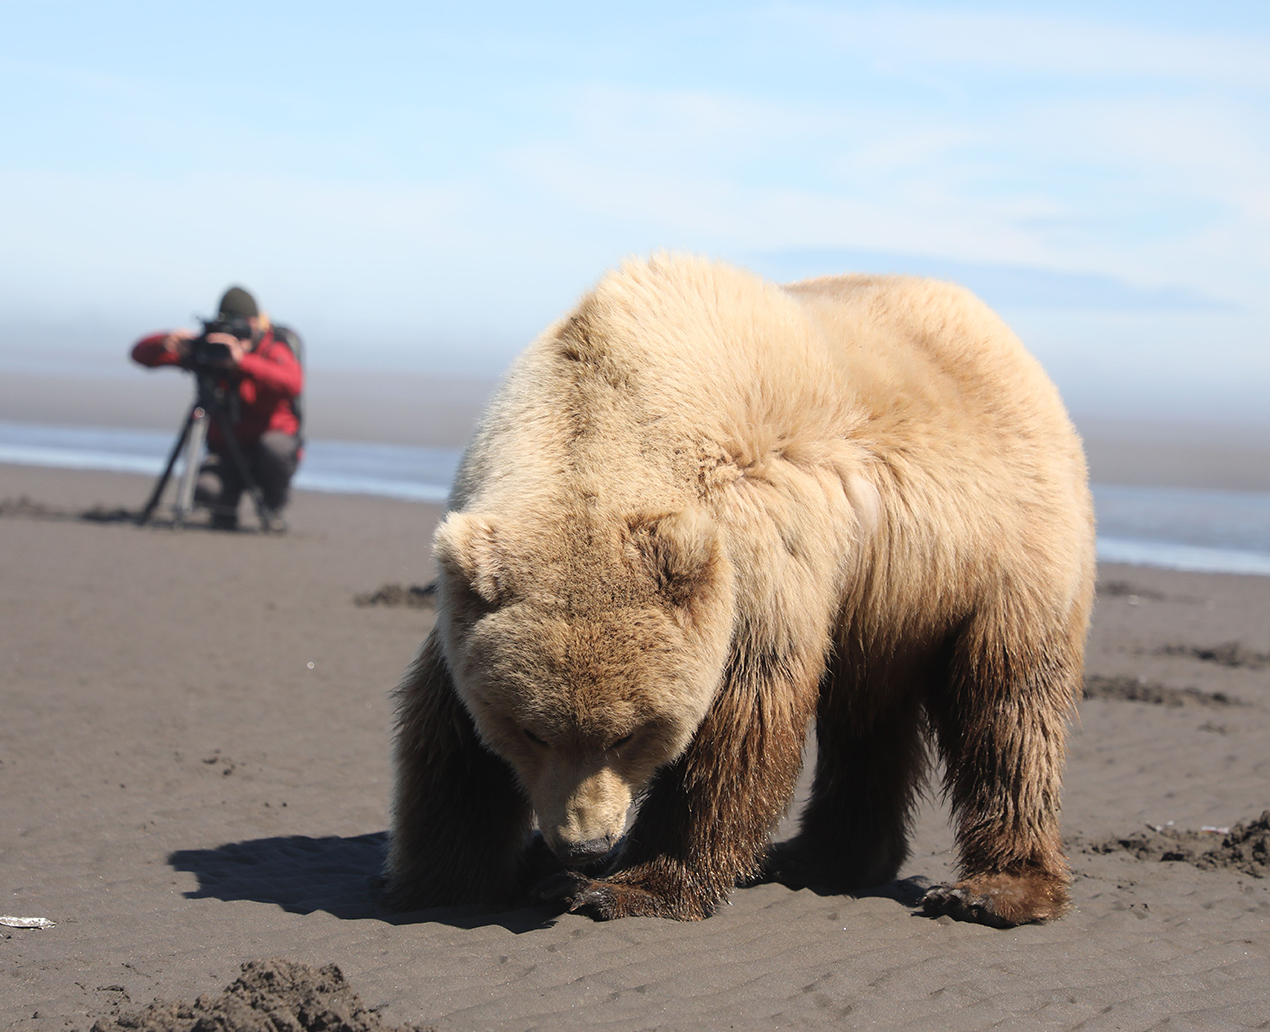 PM 155-2019 Auf Muschelsuche bei Ebbe, Lake Clark Nationalpark, Alaska 2018 © Lea Goldberg